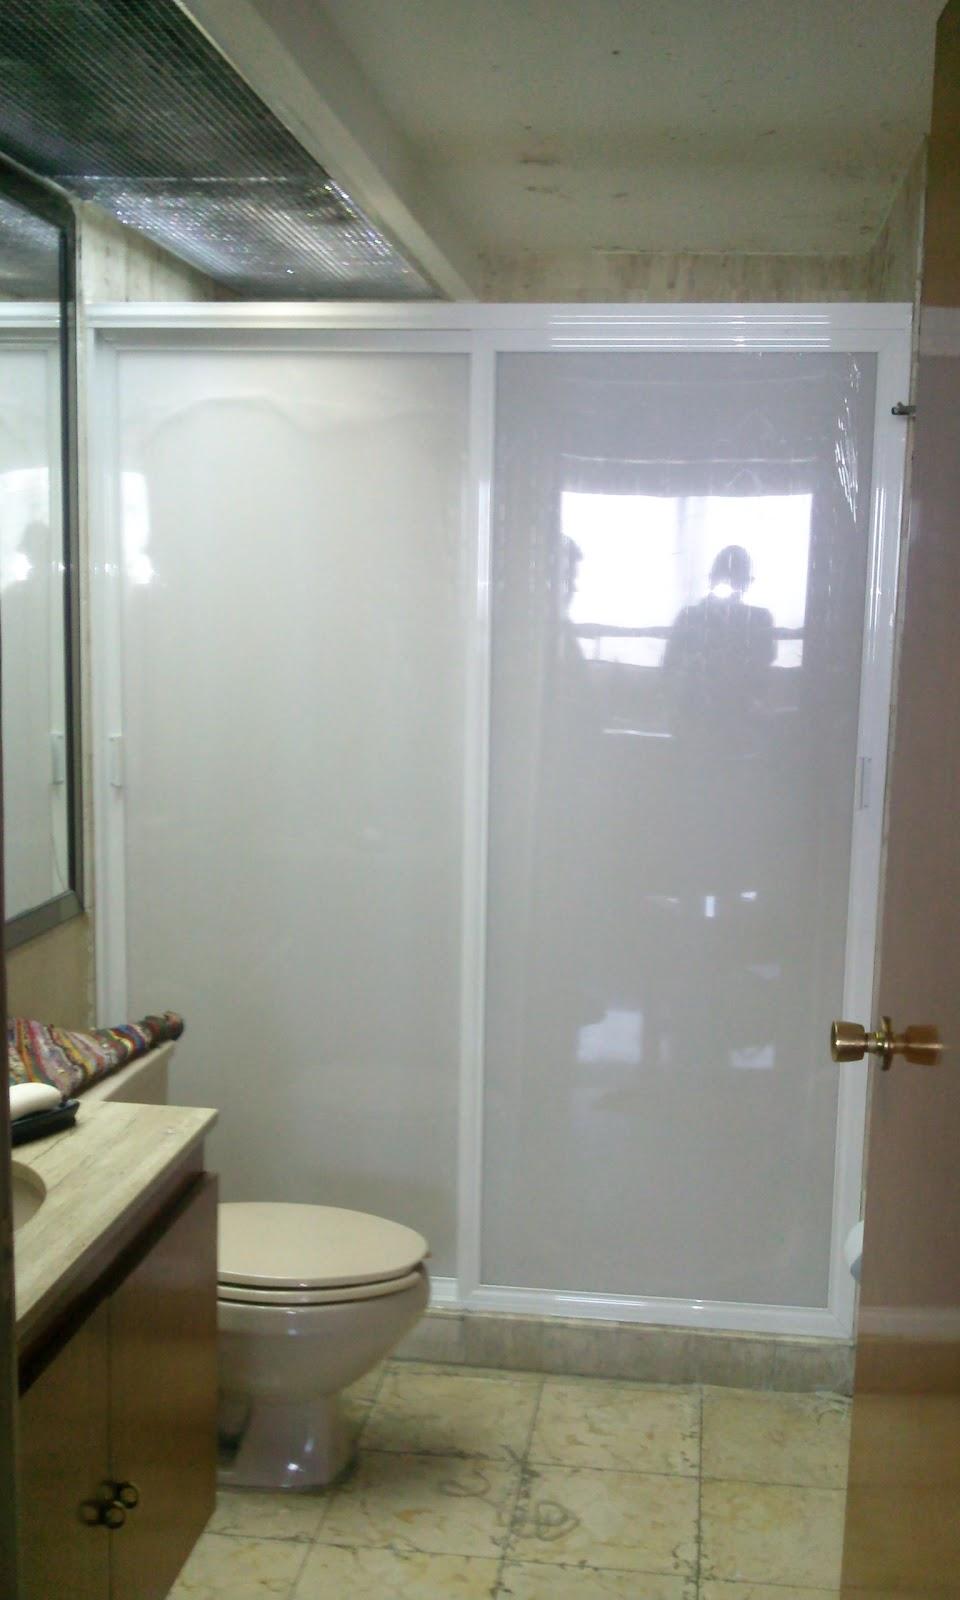 Vidrier a palo solo canceles para ba o cristal templado - Puerta de cristal abatible ...